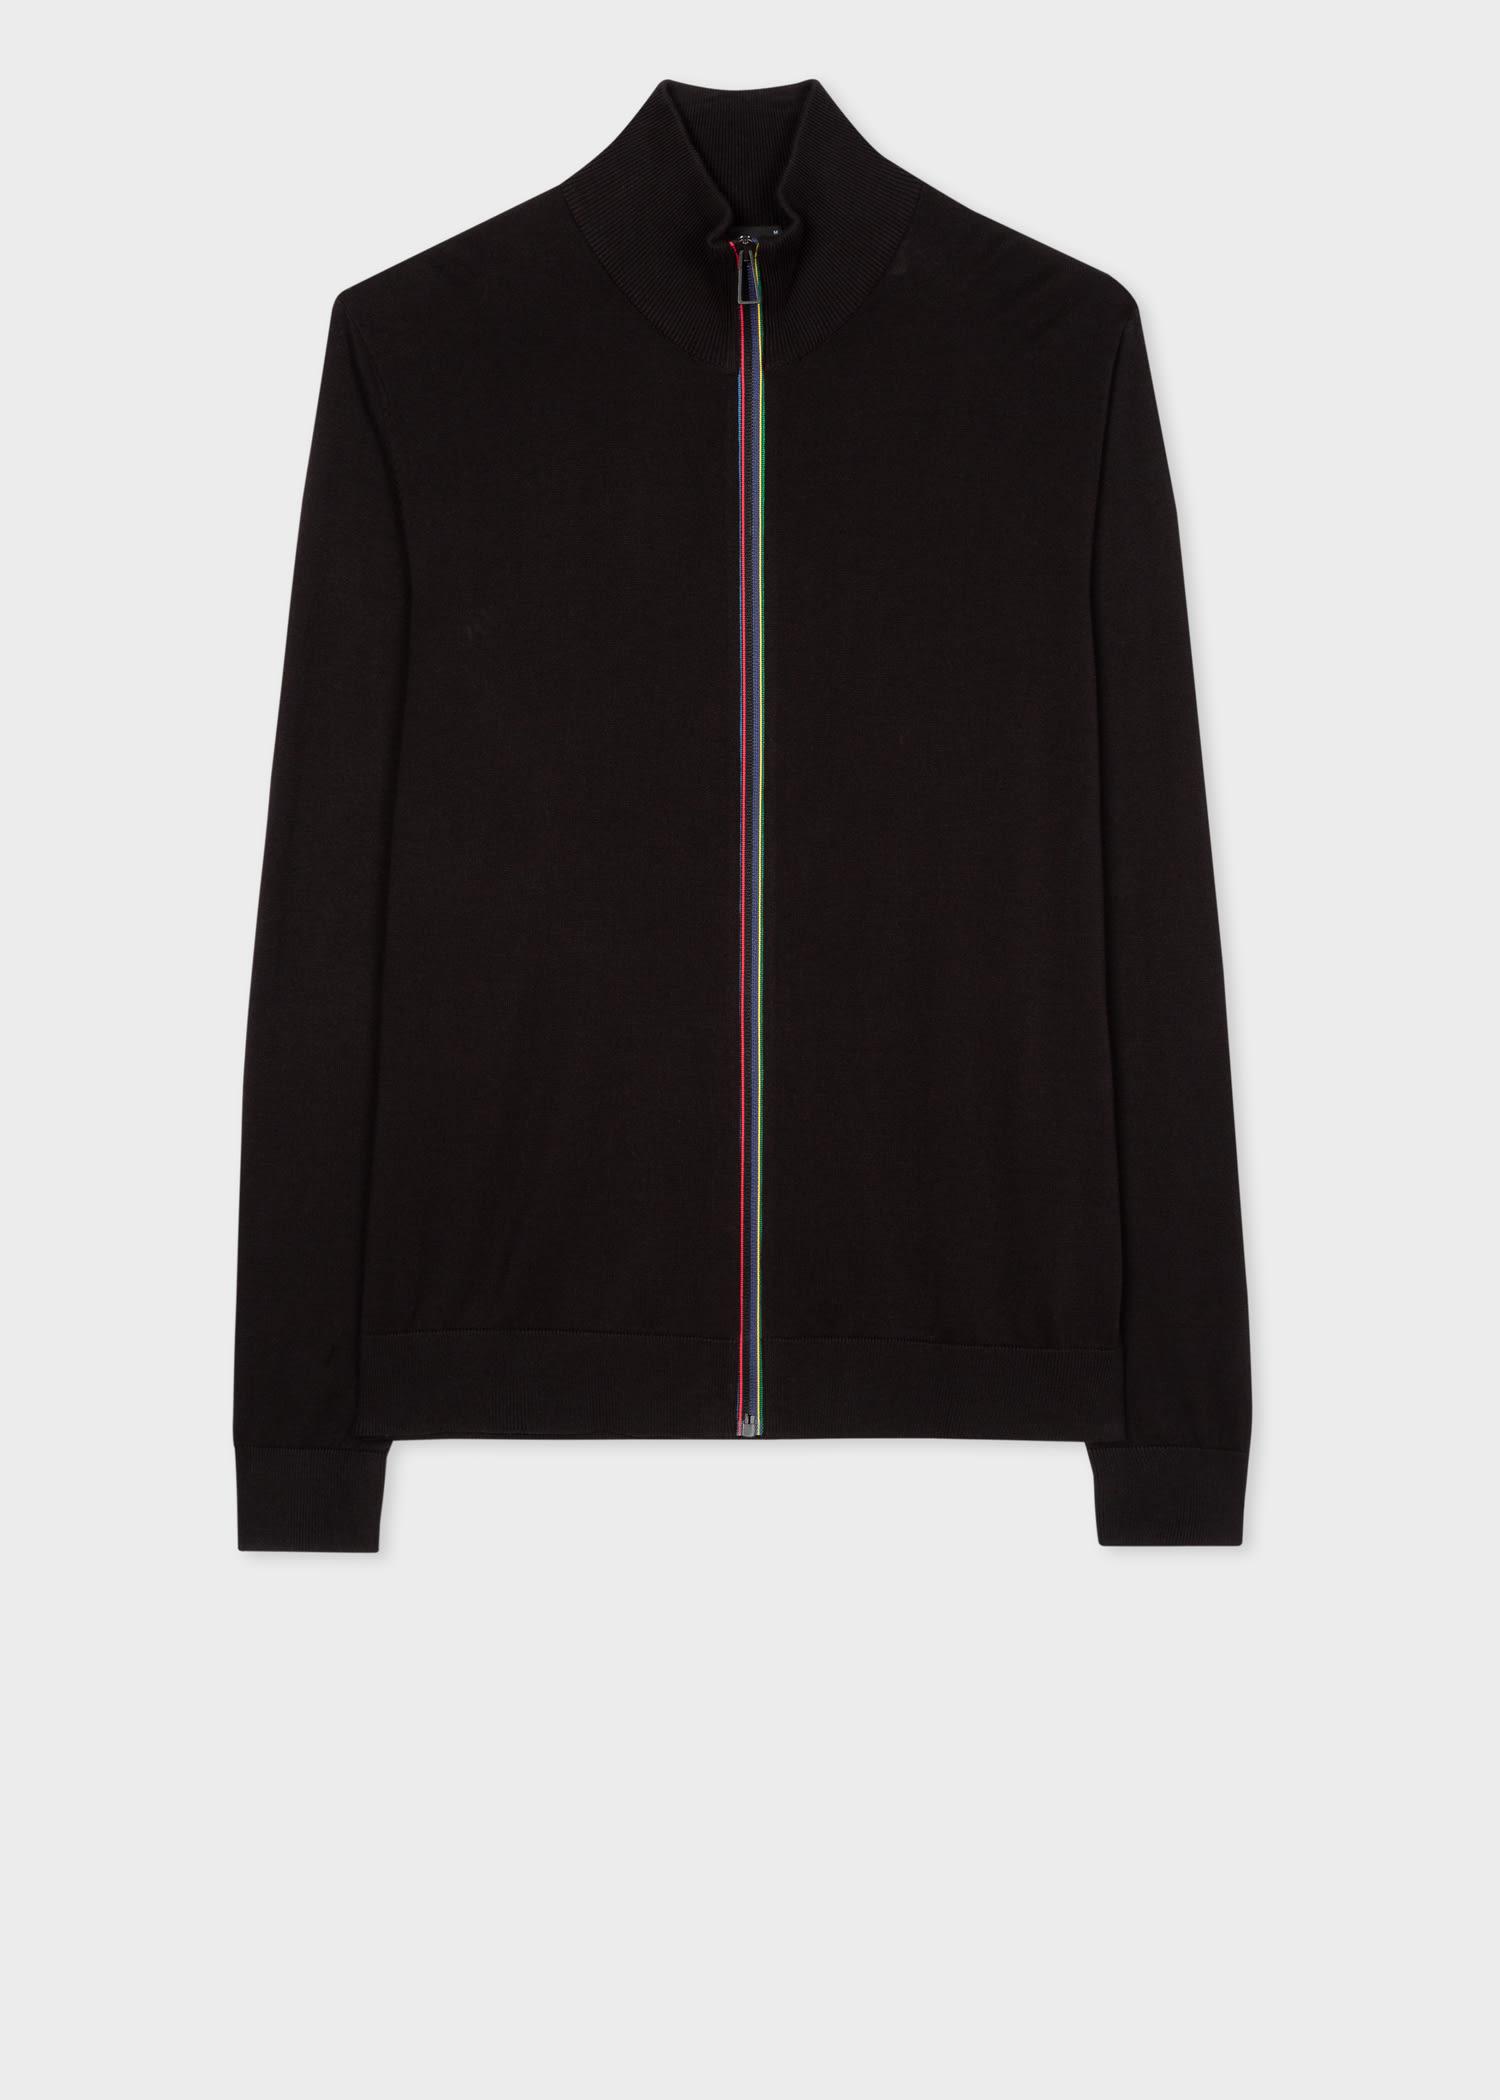 Men's Black 'Sports Stripe' Zip Cardigan